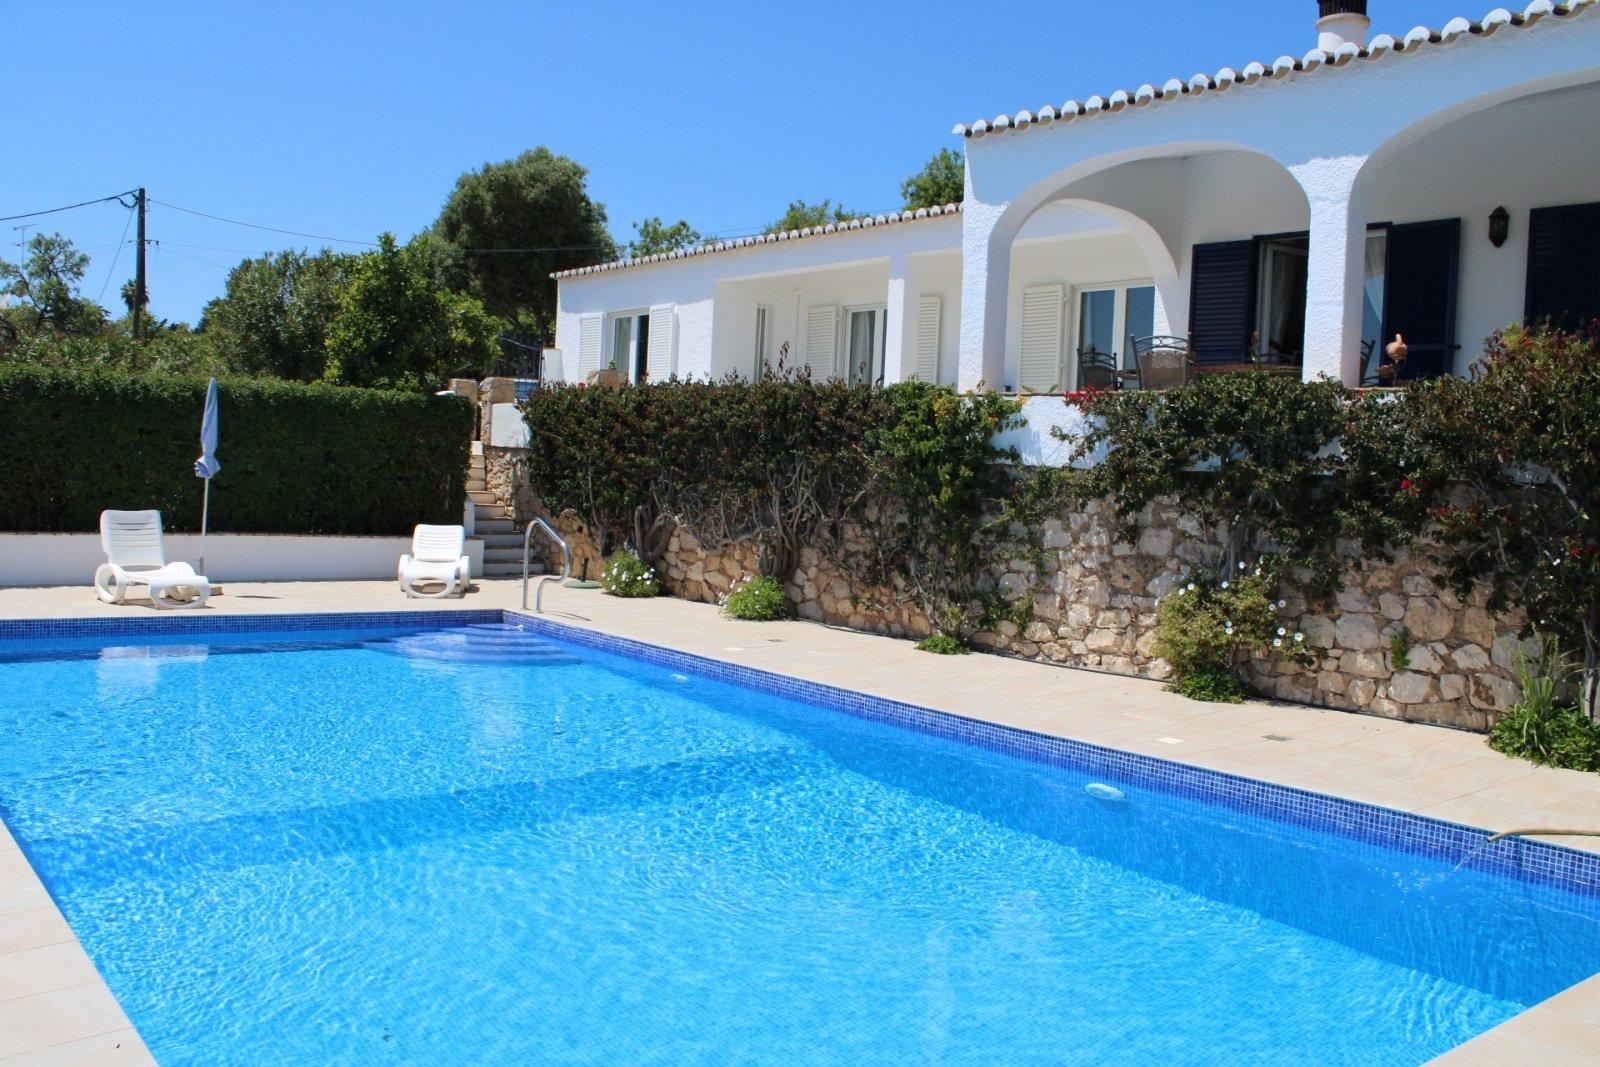 4 Bedroom Villa Praia da Luz, Western Algarve Ref: GV620